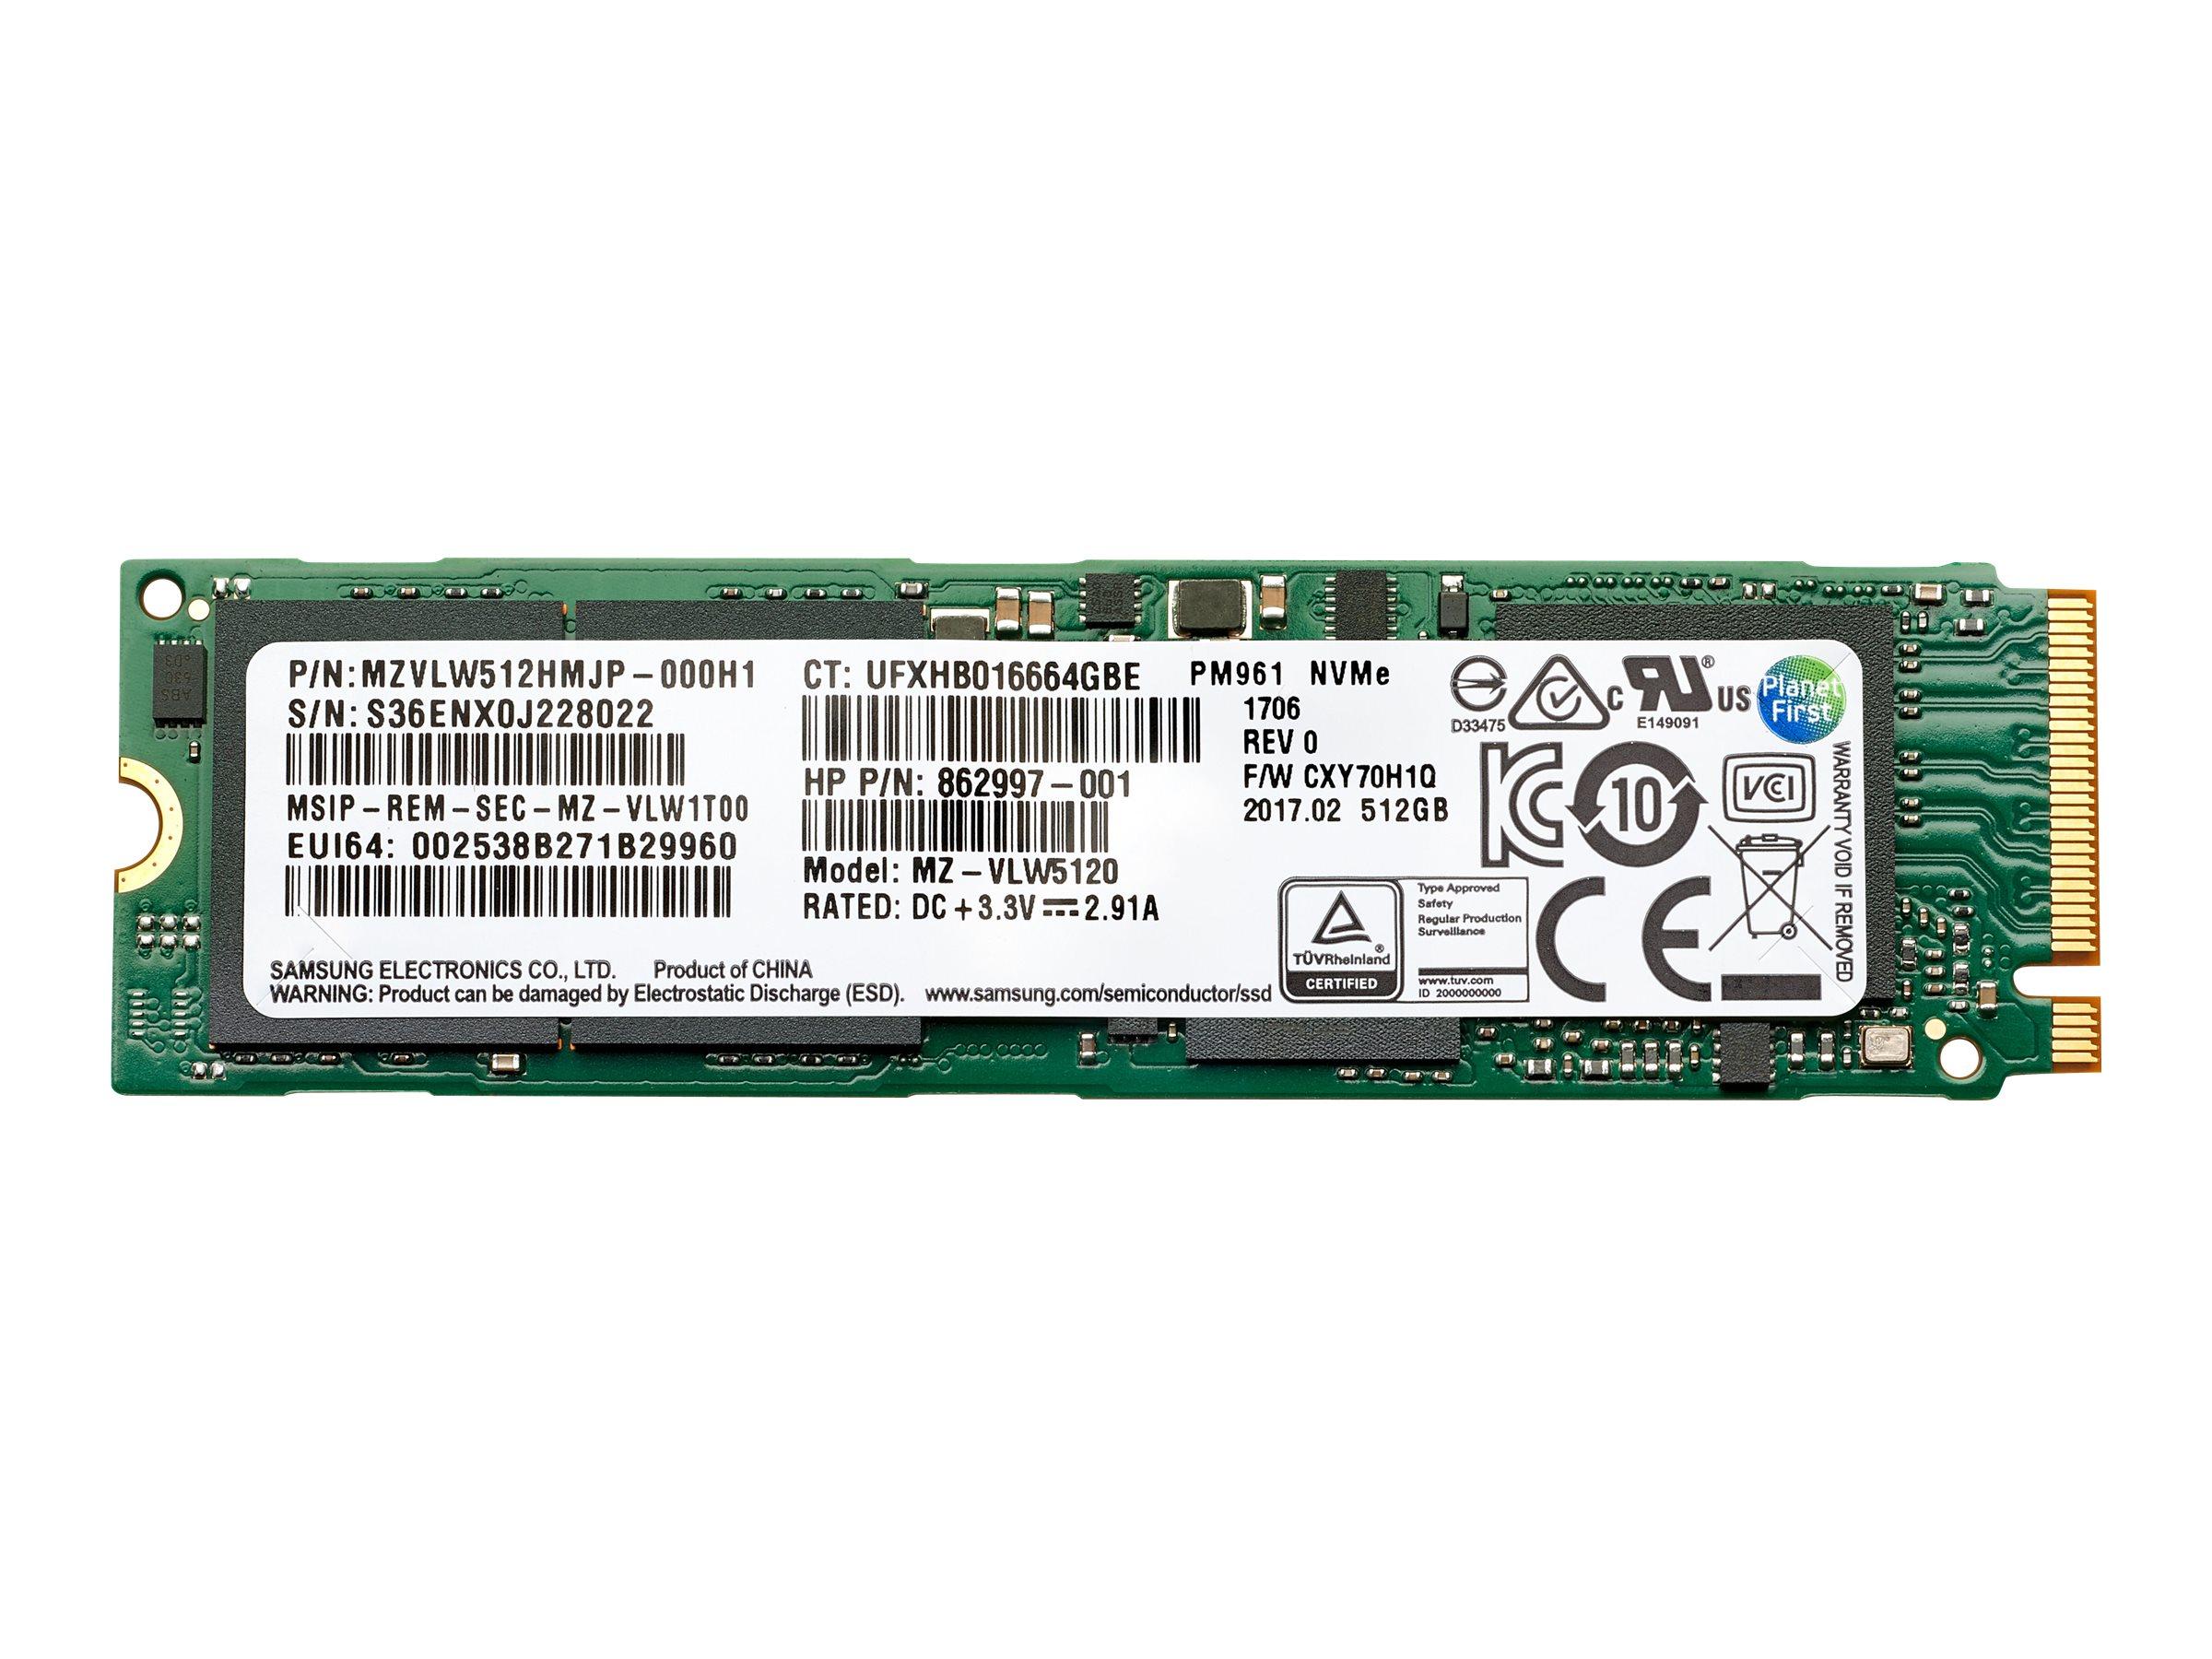 HP - Solid-State-Disk - 512 GB - intern - M.2 2280 (doppelseitig) (in 6,4 cm Träger) (in 2,5 Zoll Träger) - SATA 6Gb/s